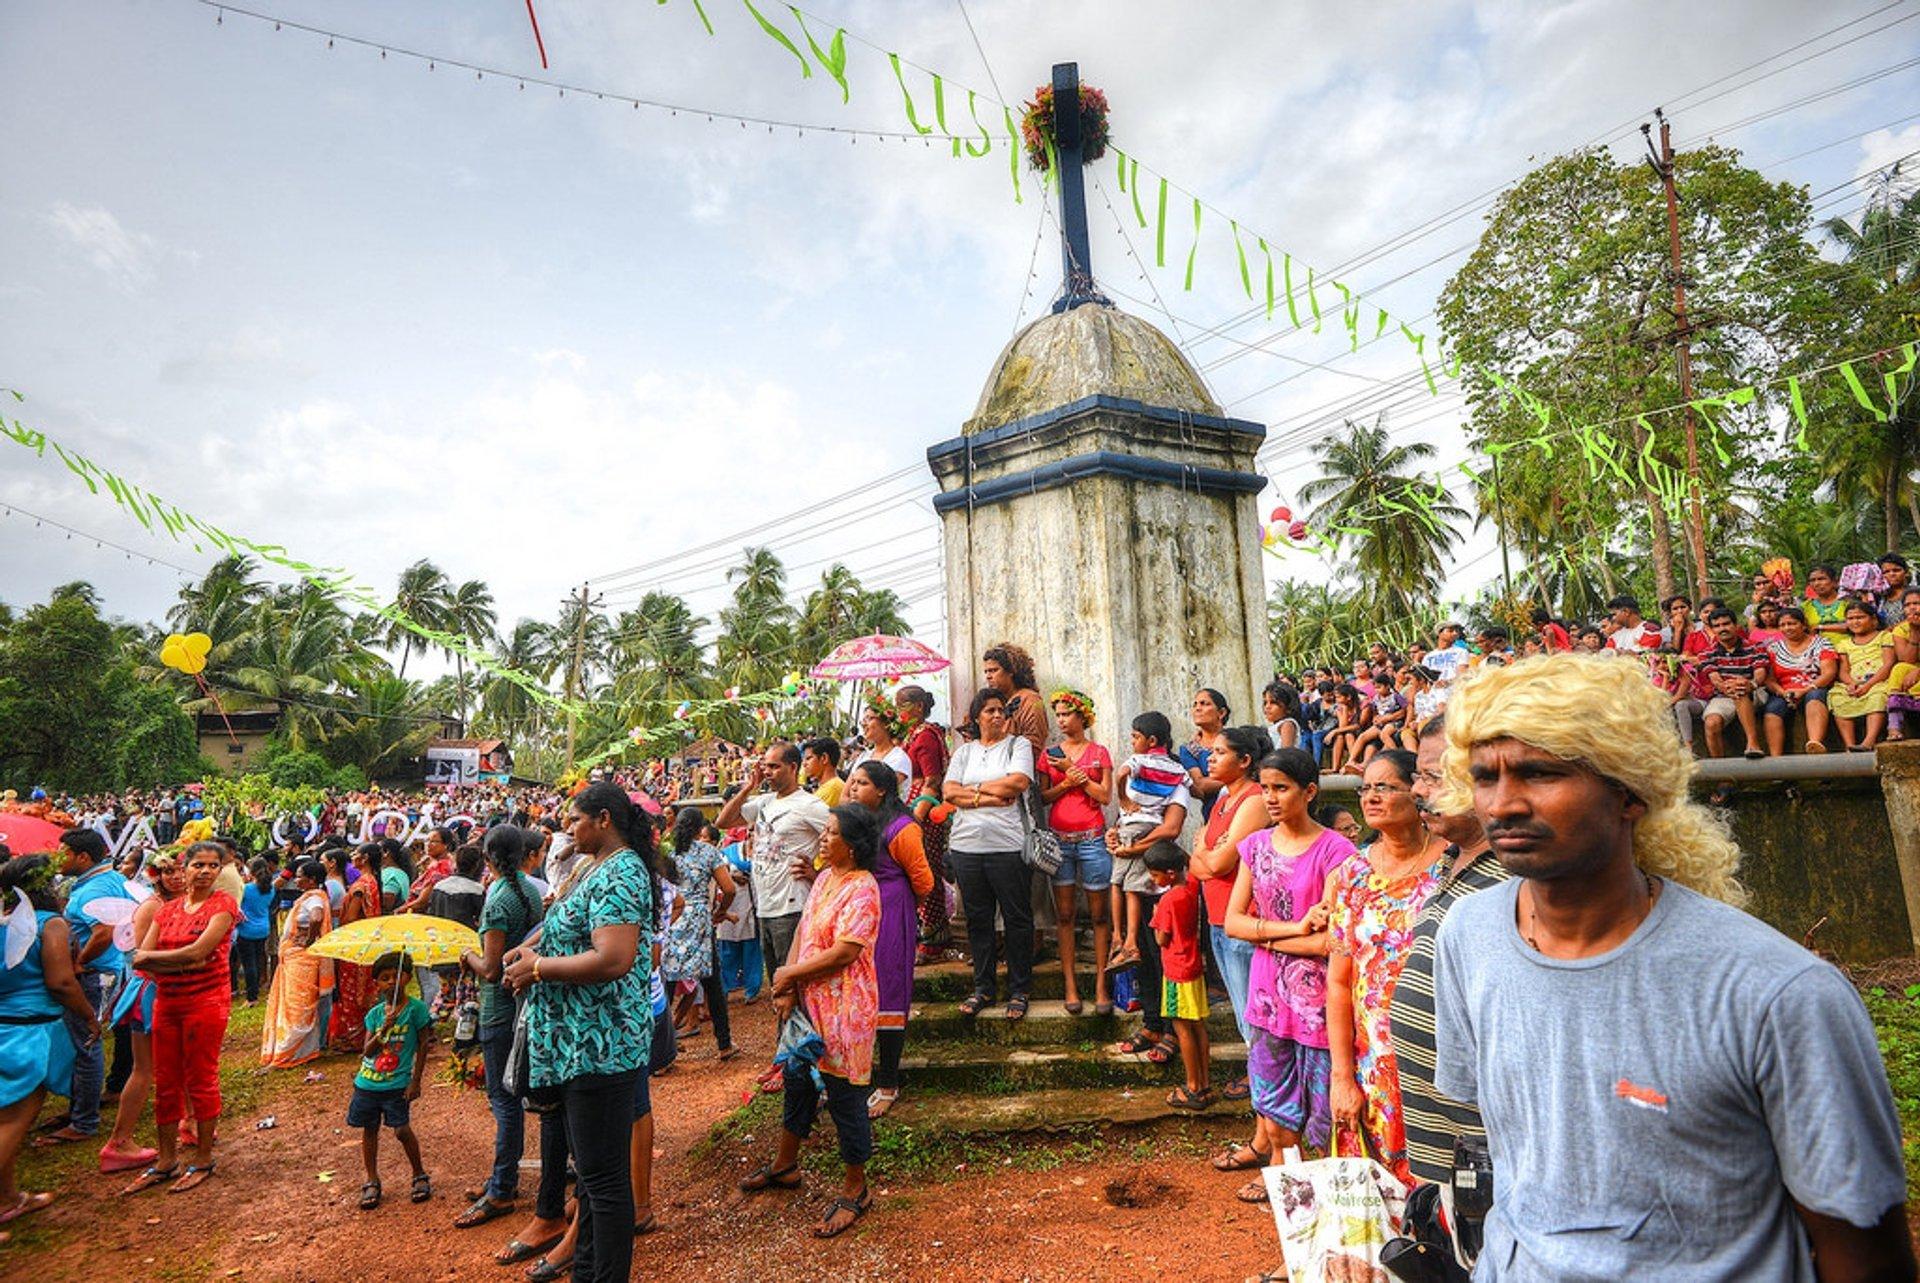 Sao Joao Festival in Goa - Best Season 2019